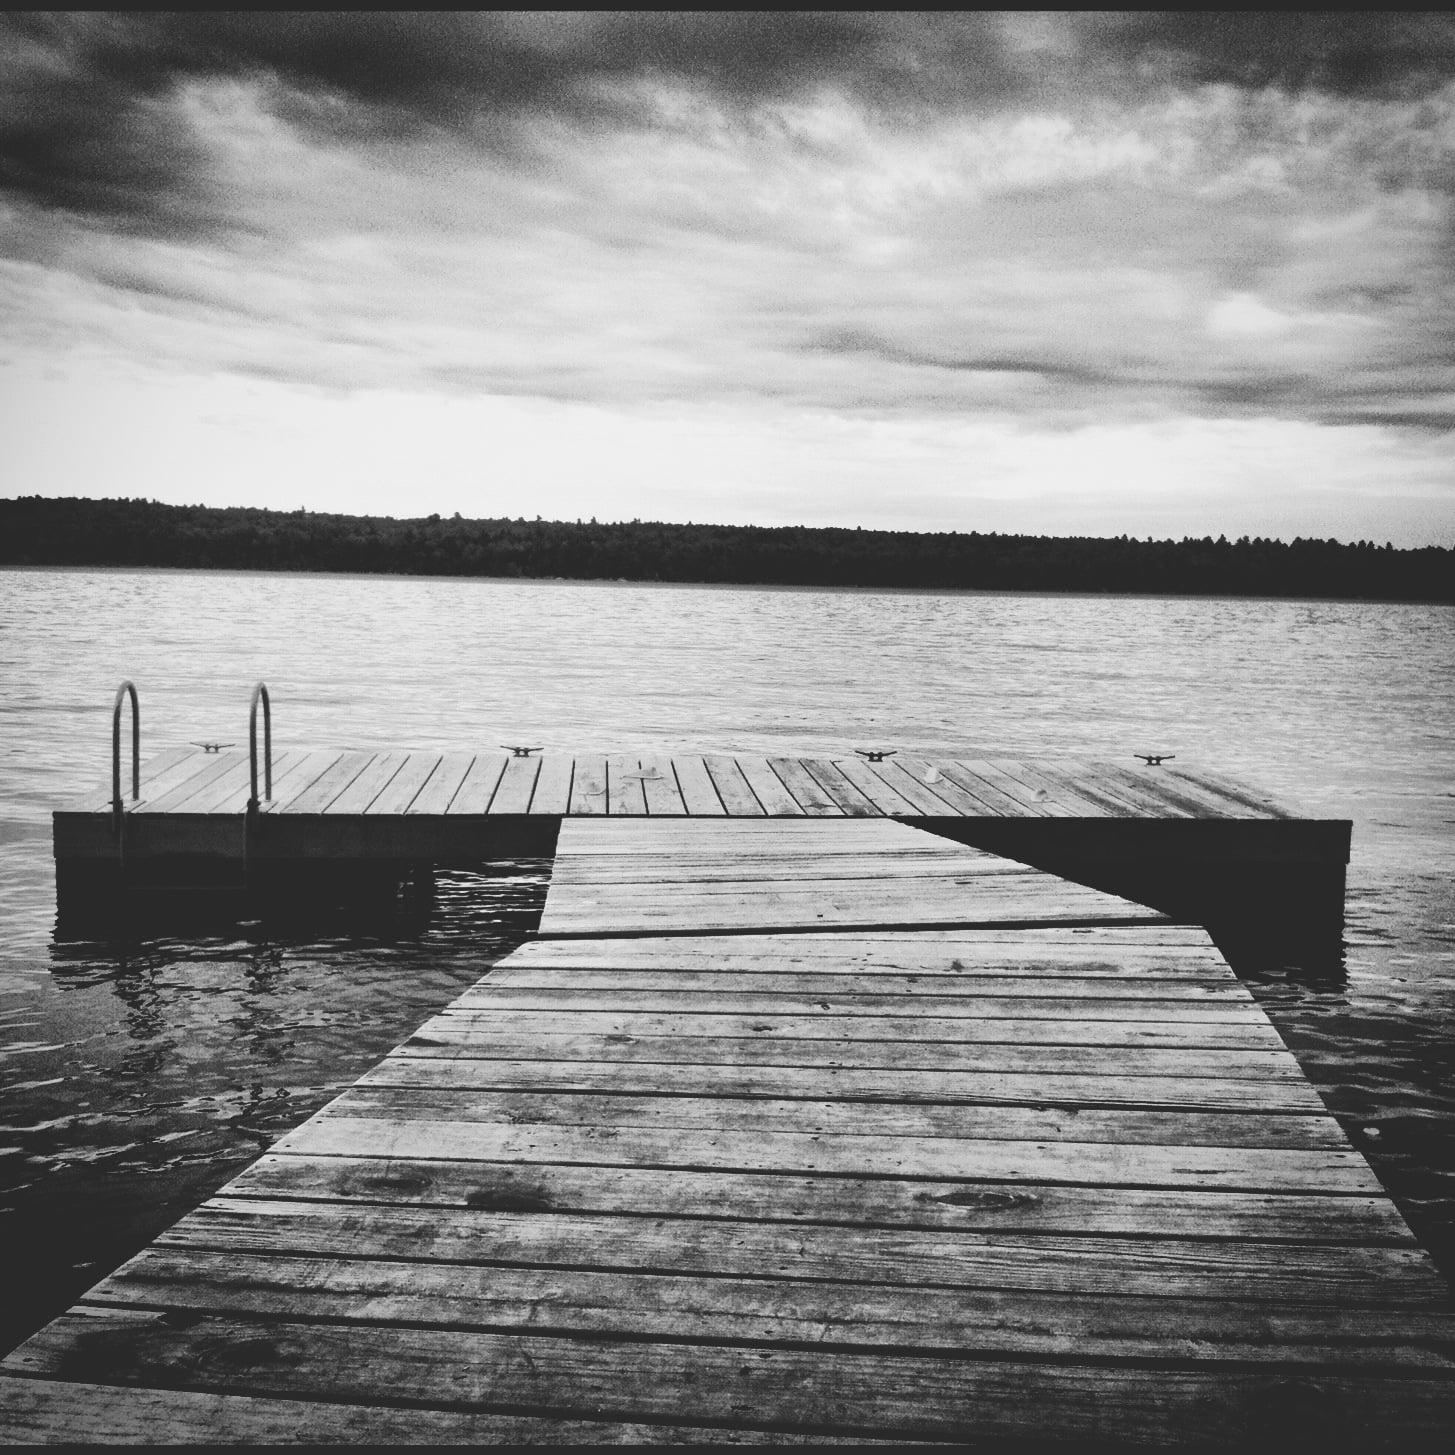 maine_lake_dock.jpg